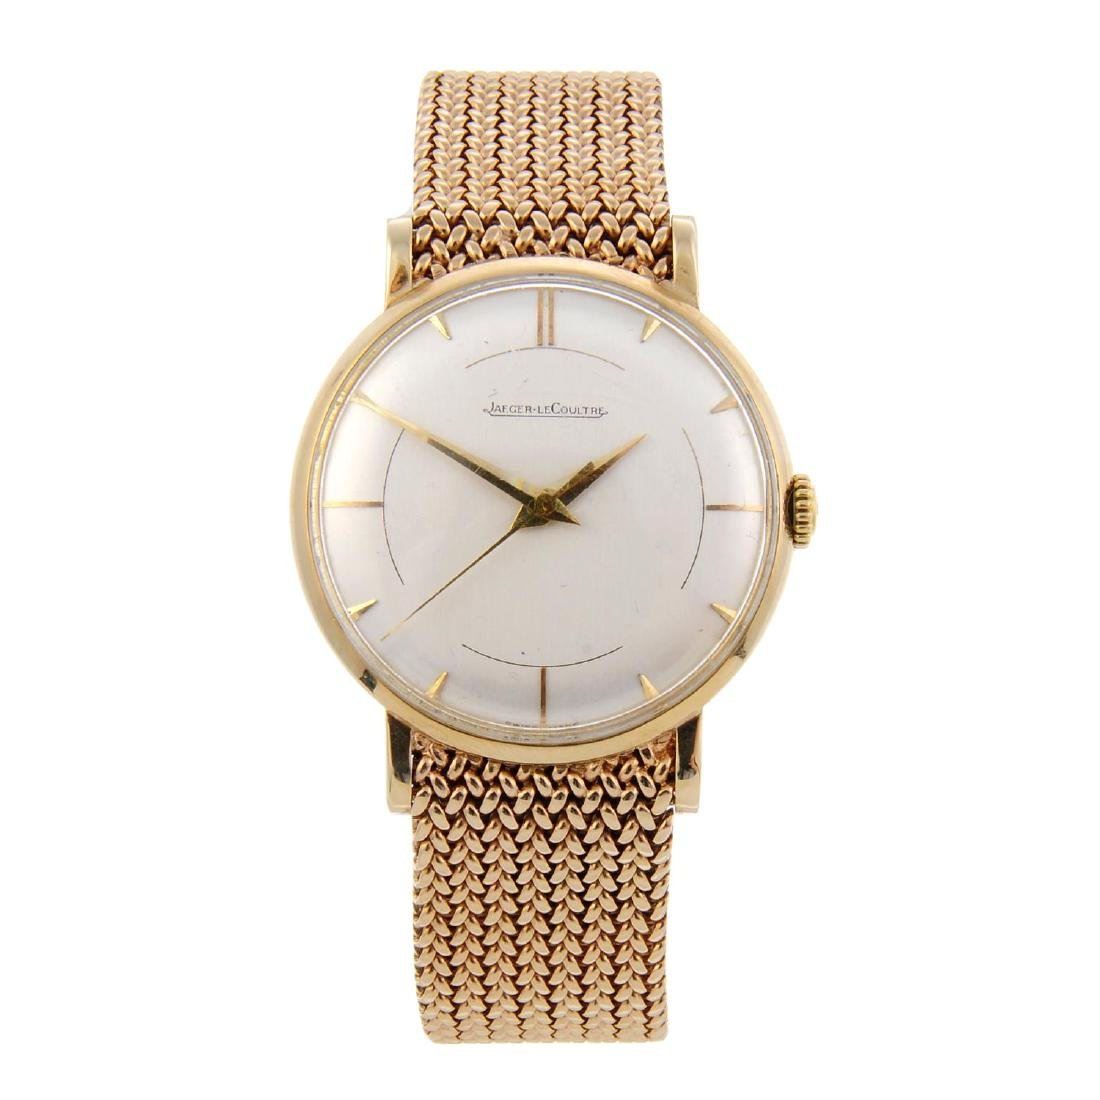 JAEGER-LECOULTRE - a gentleman's bracelet watch. 9ct